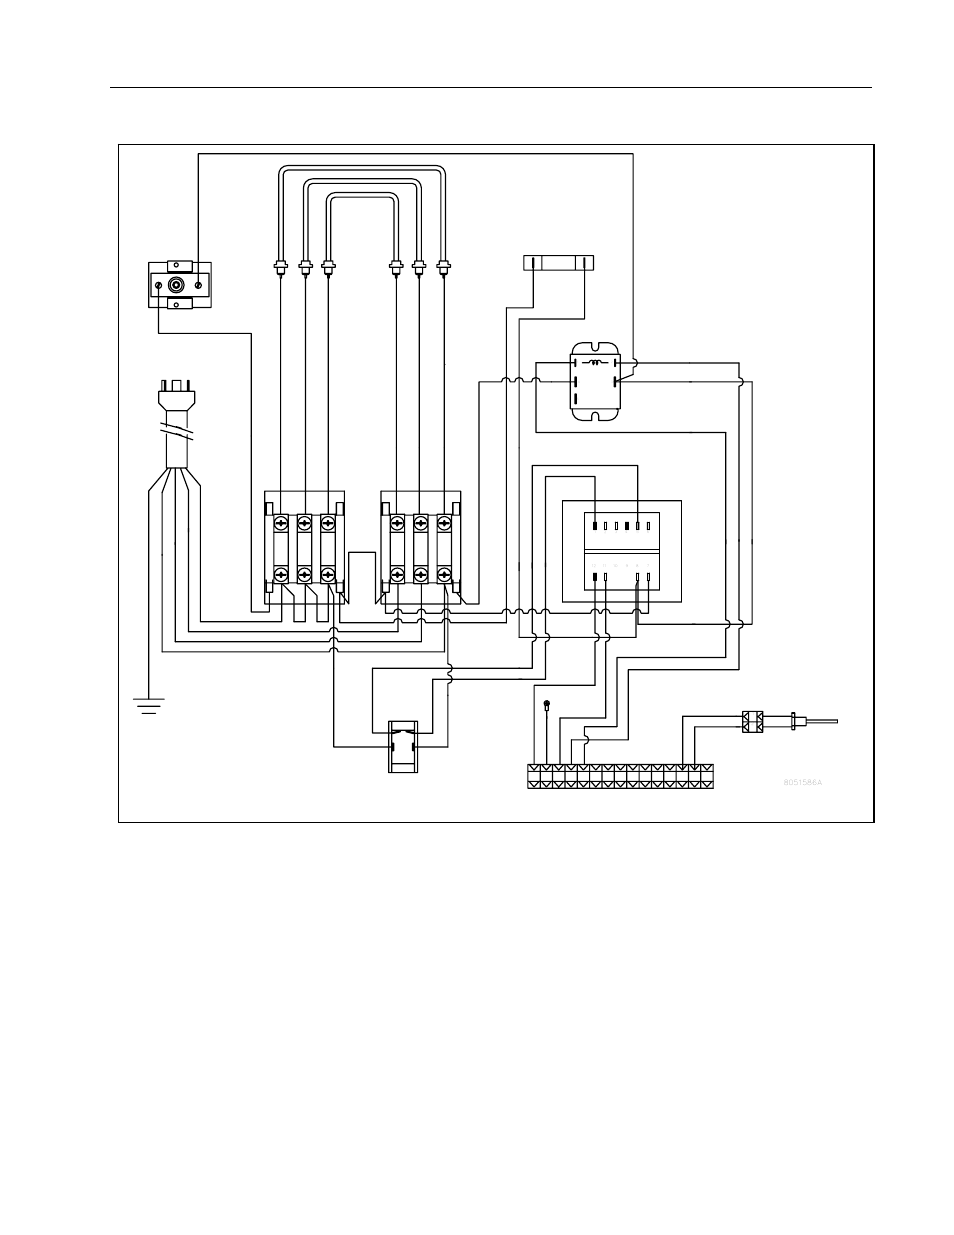 medium resolution of 3 wiring diagram 3 phase wye frymaster dean sr114e user manual page 10